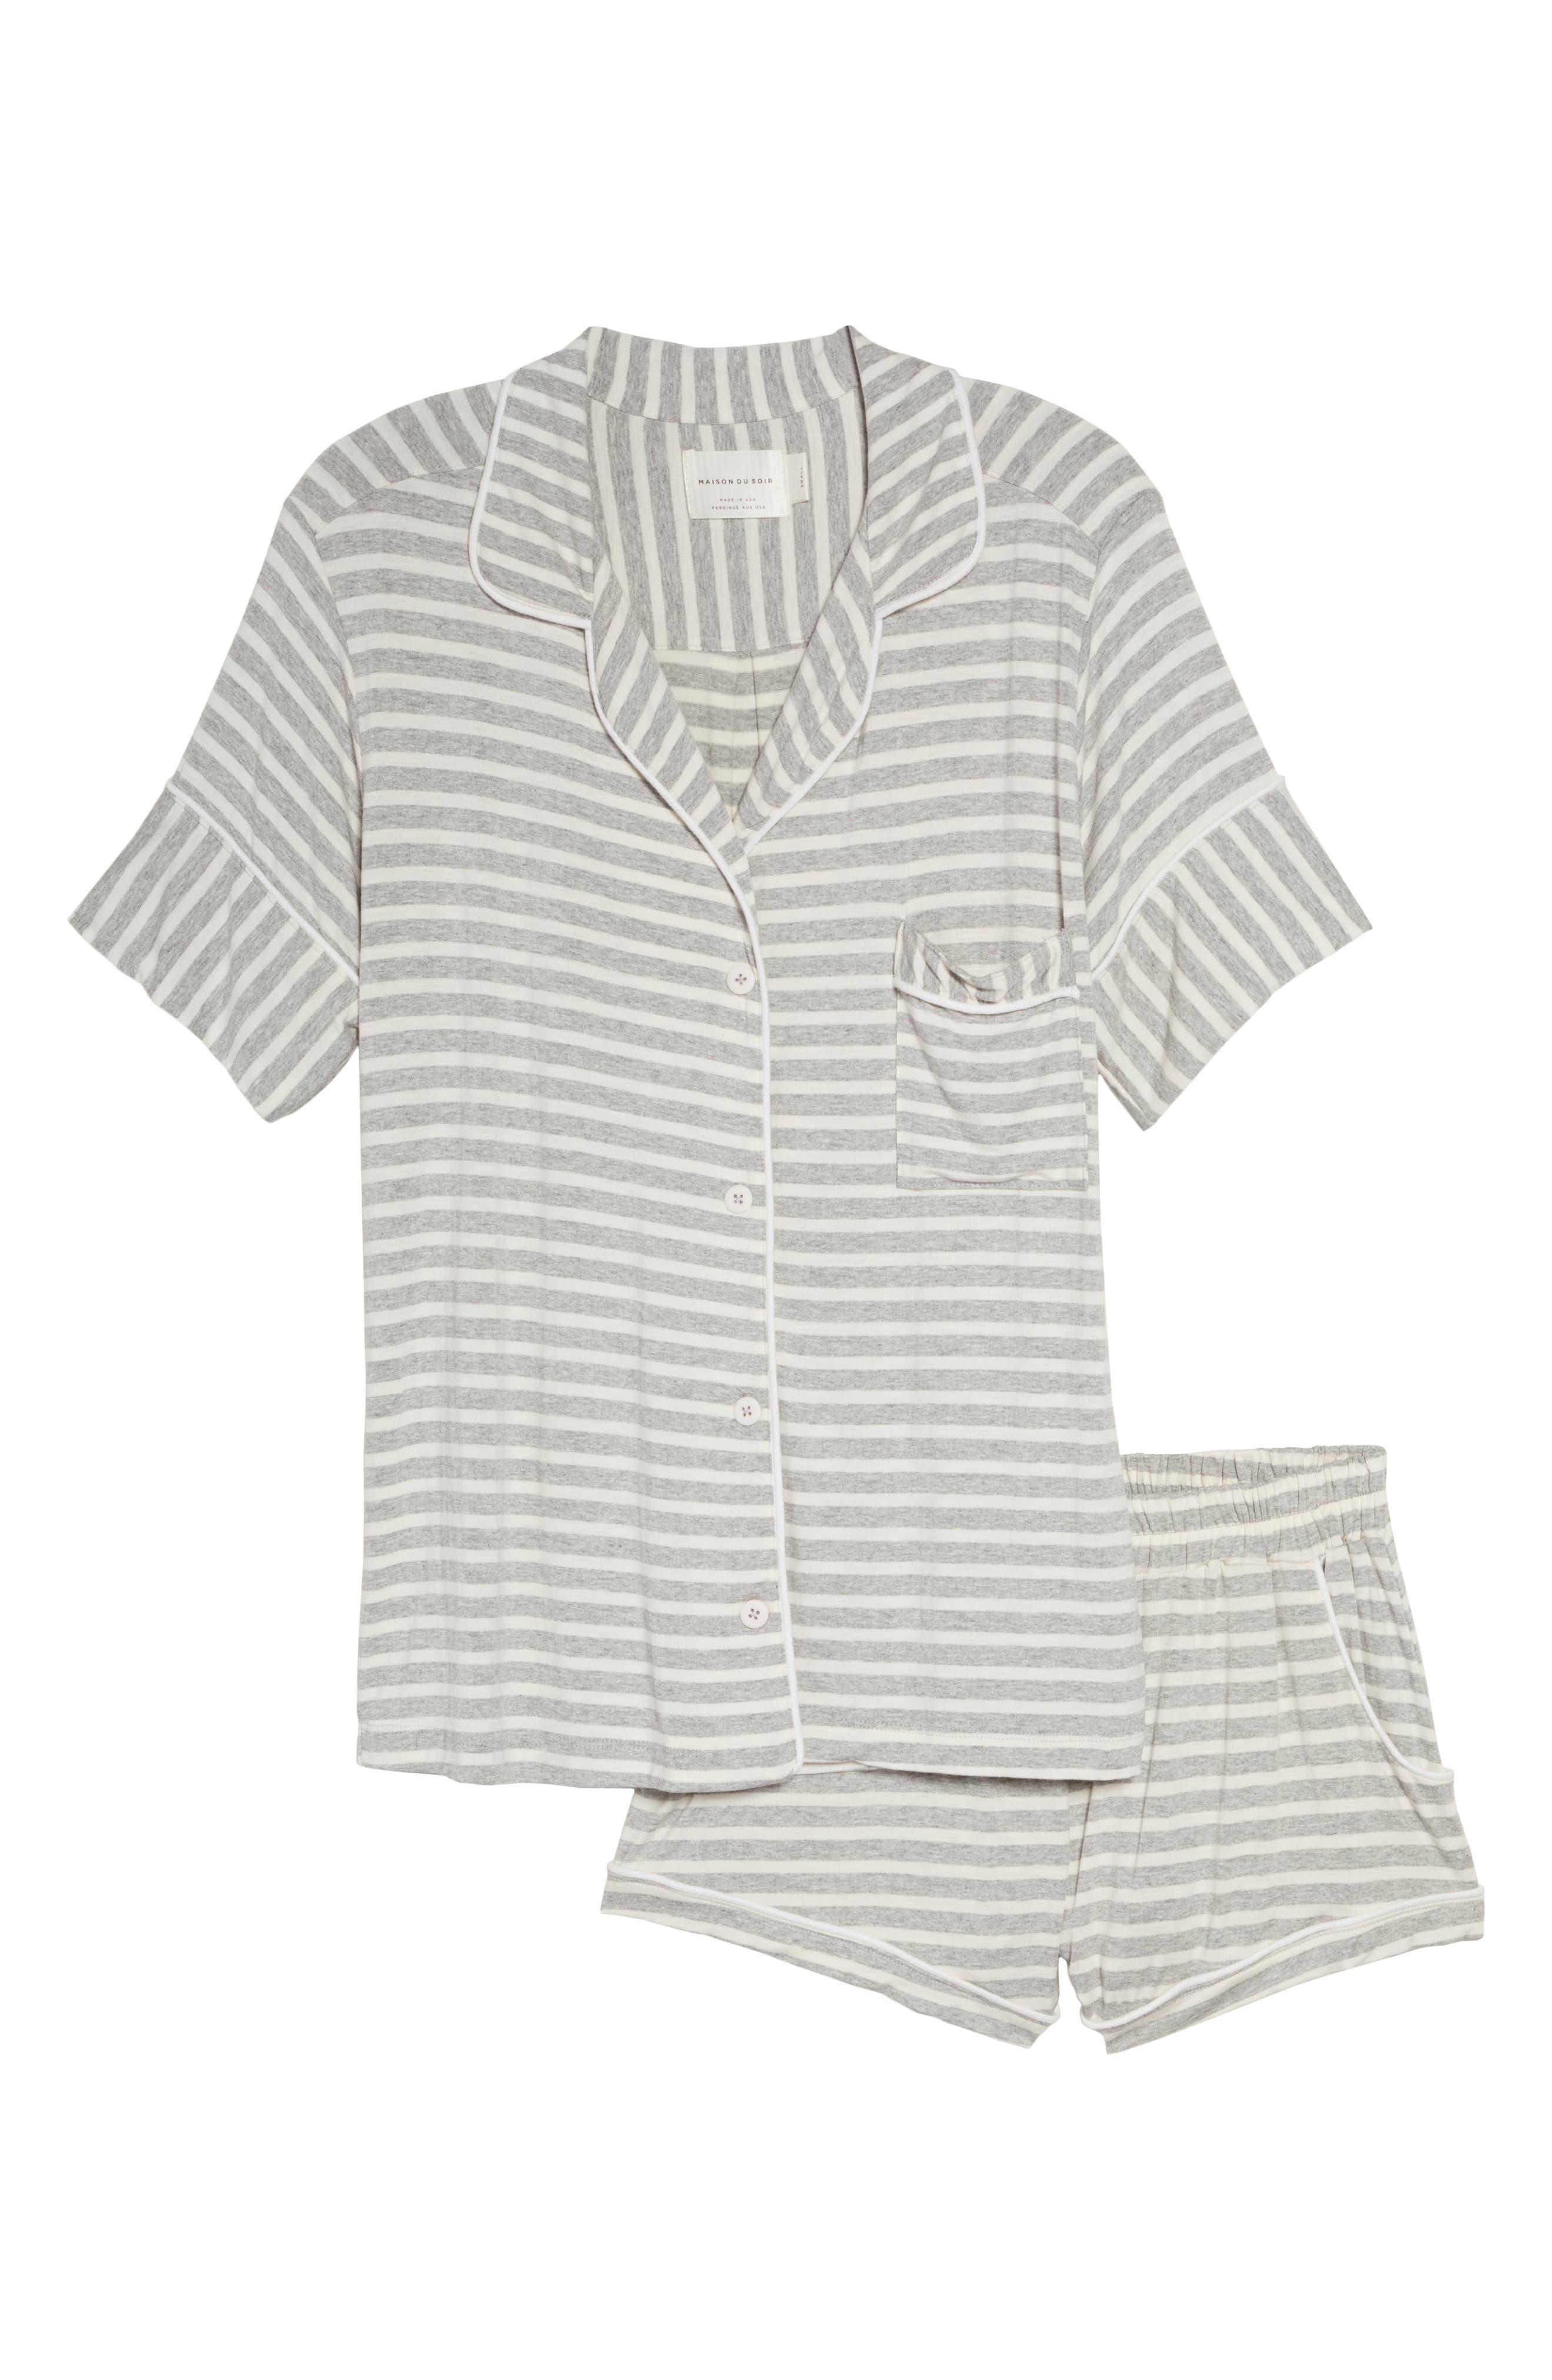 Monaco Short Pajamas,                             Alternate thumbnail 6, color,                             GREY STRIPE